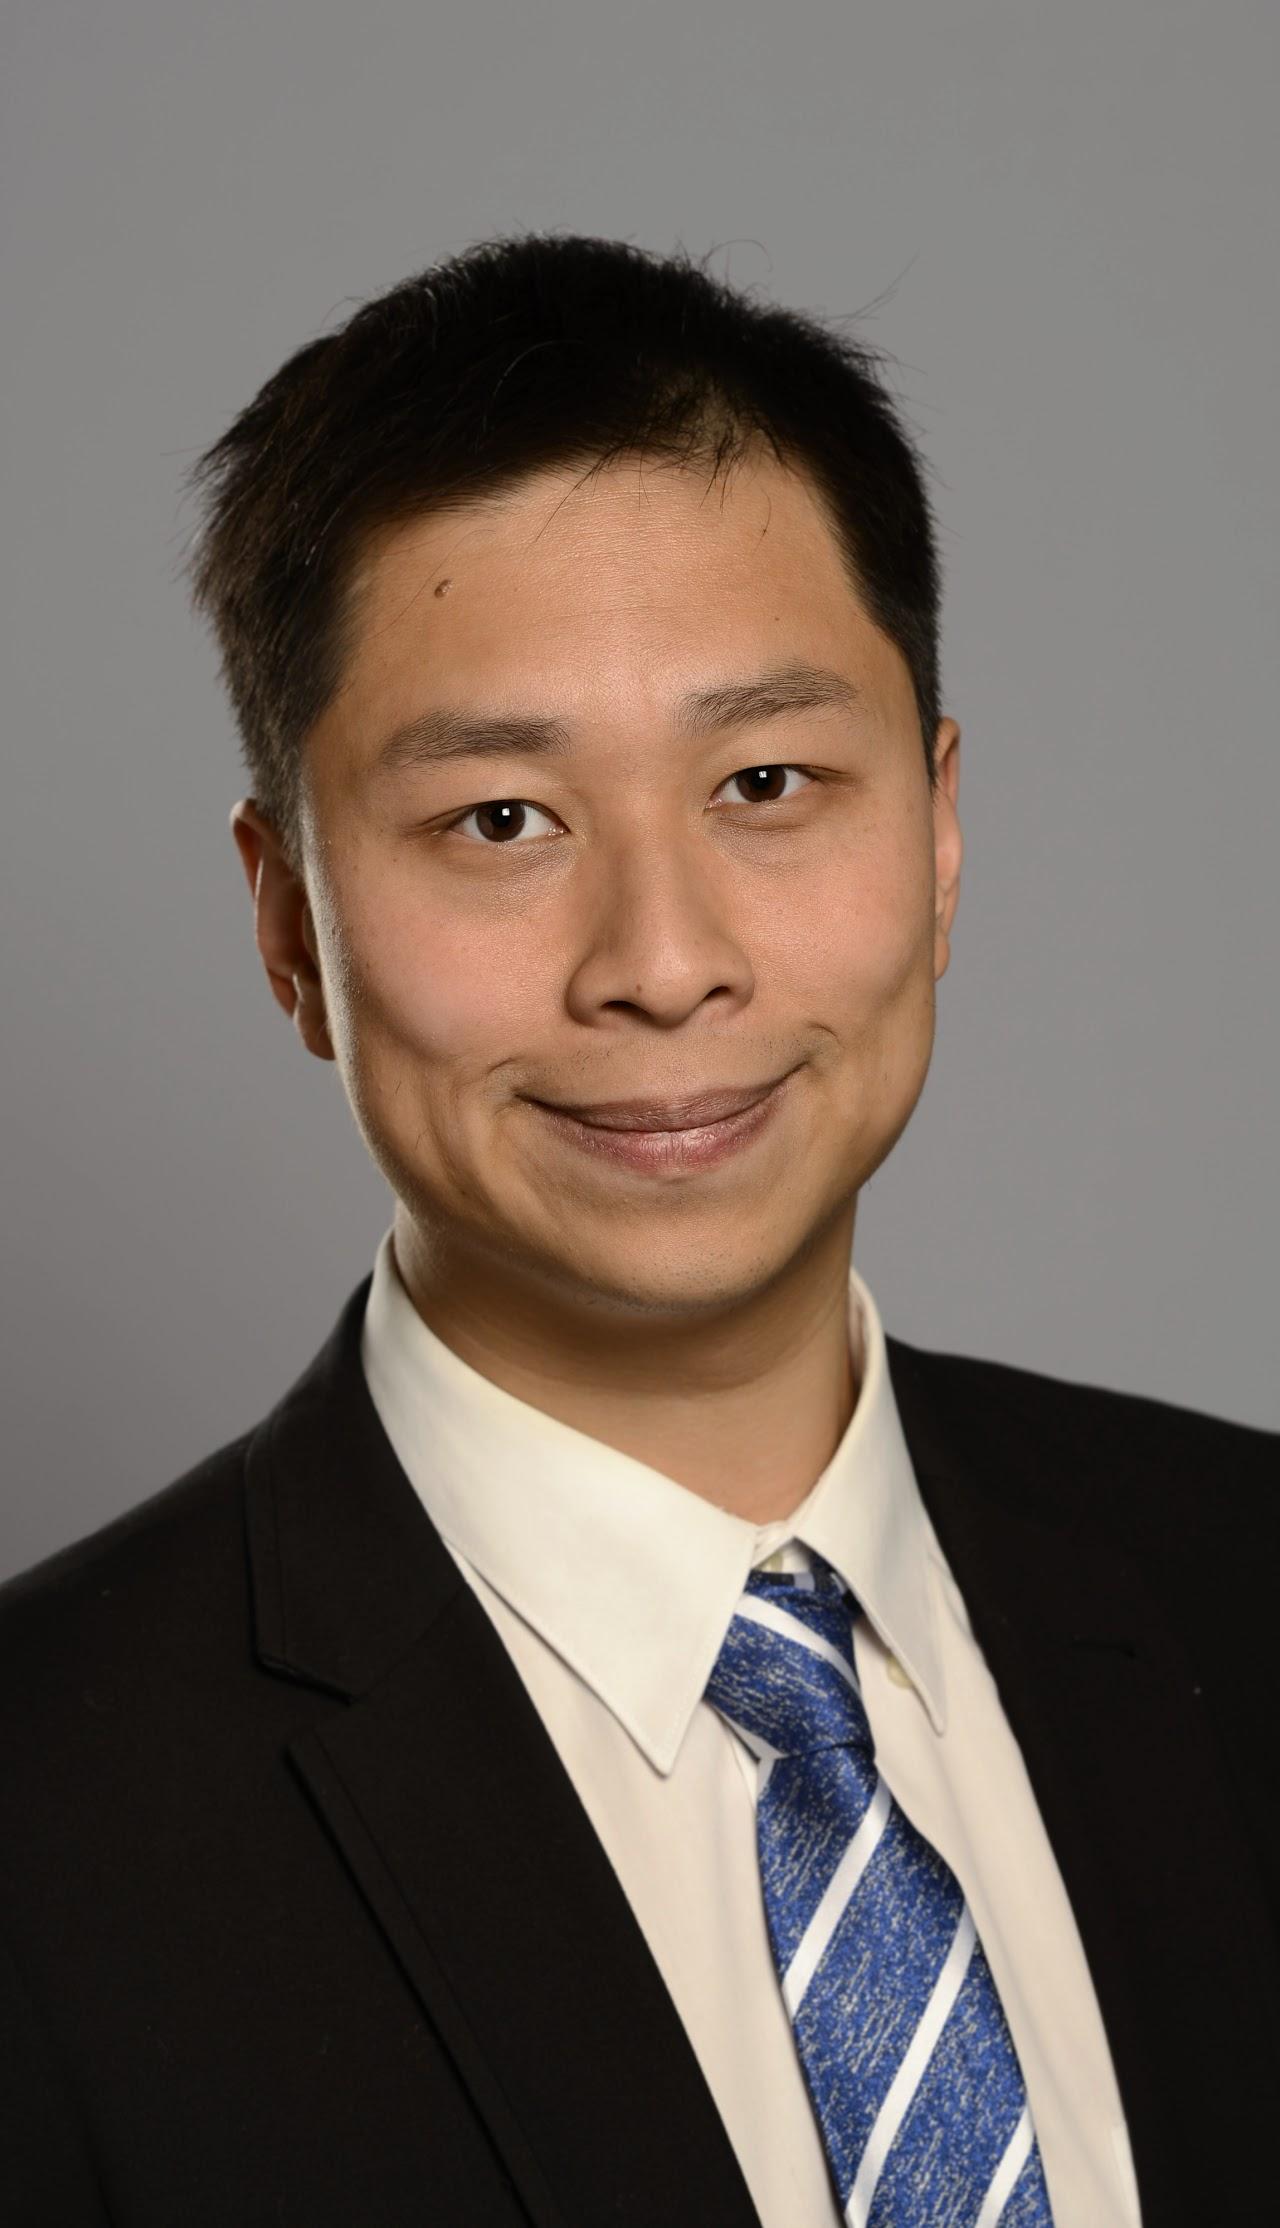 Gary Tse, MD, PhD, FRCP, FFPH